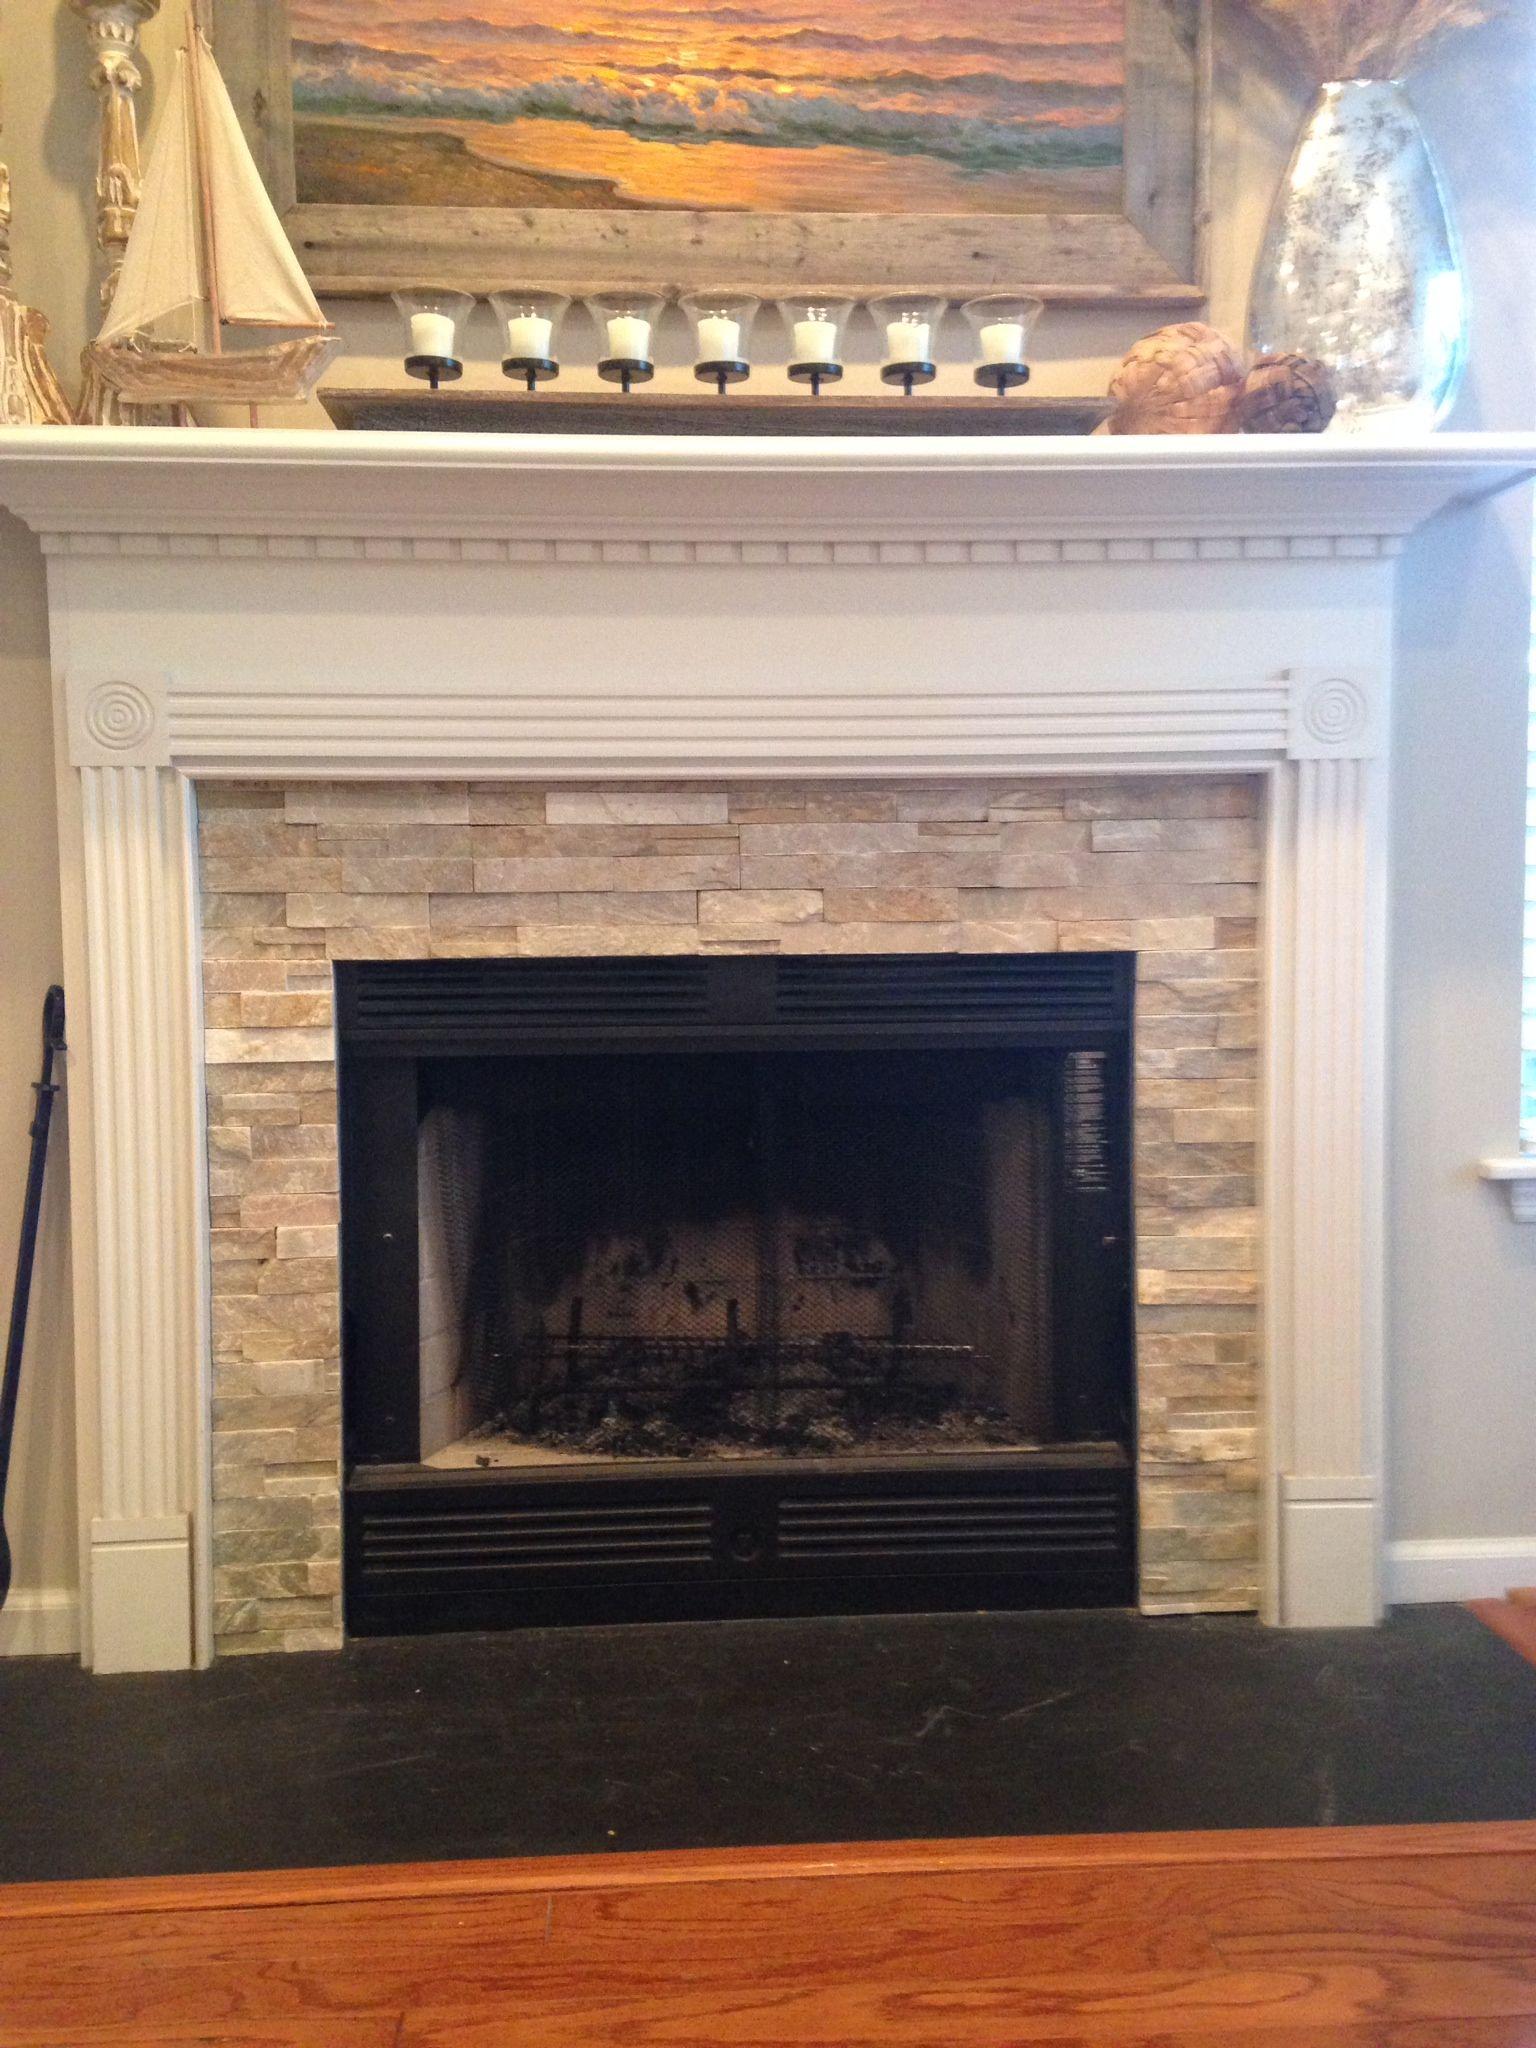 Wainscoting Fireplace Awesome Fireplace Idea Mantel Wainscoting Design Craftsman